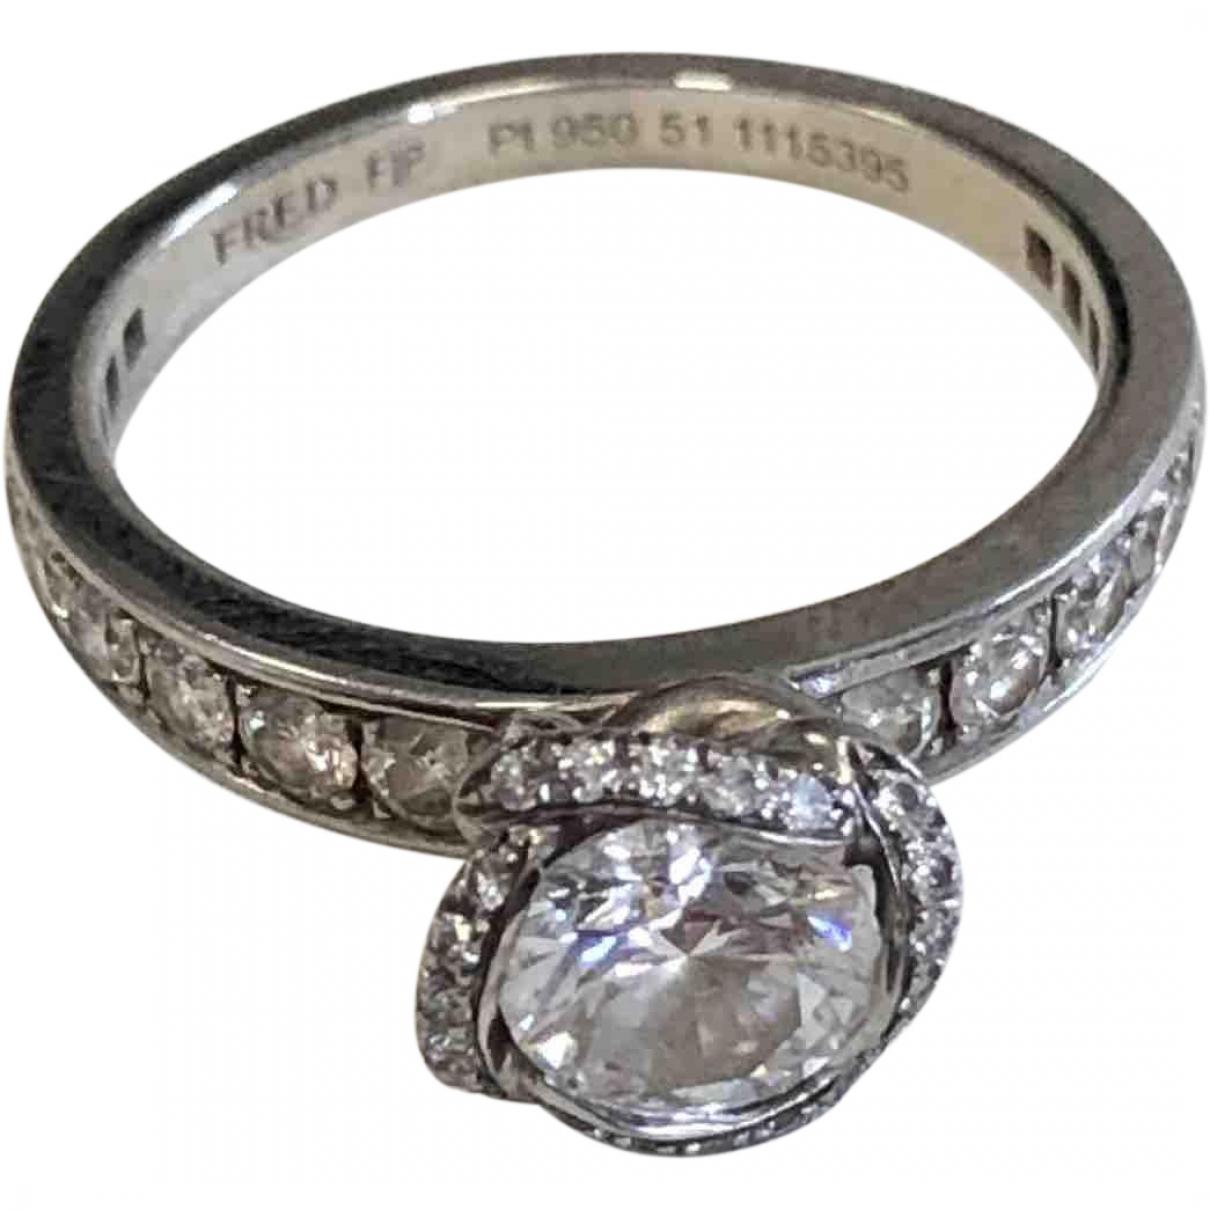 Fred \N Platinum ring for Women \N